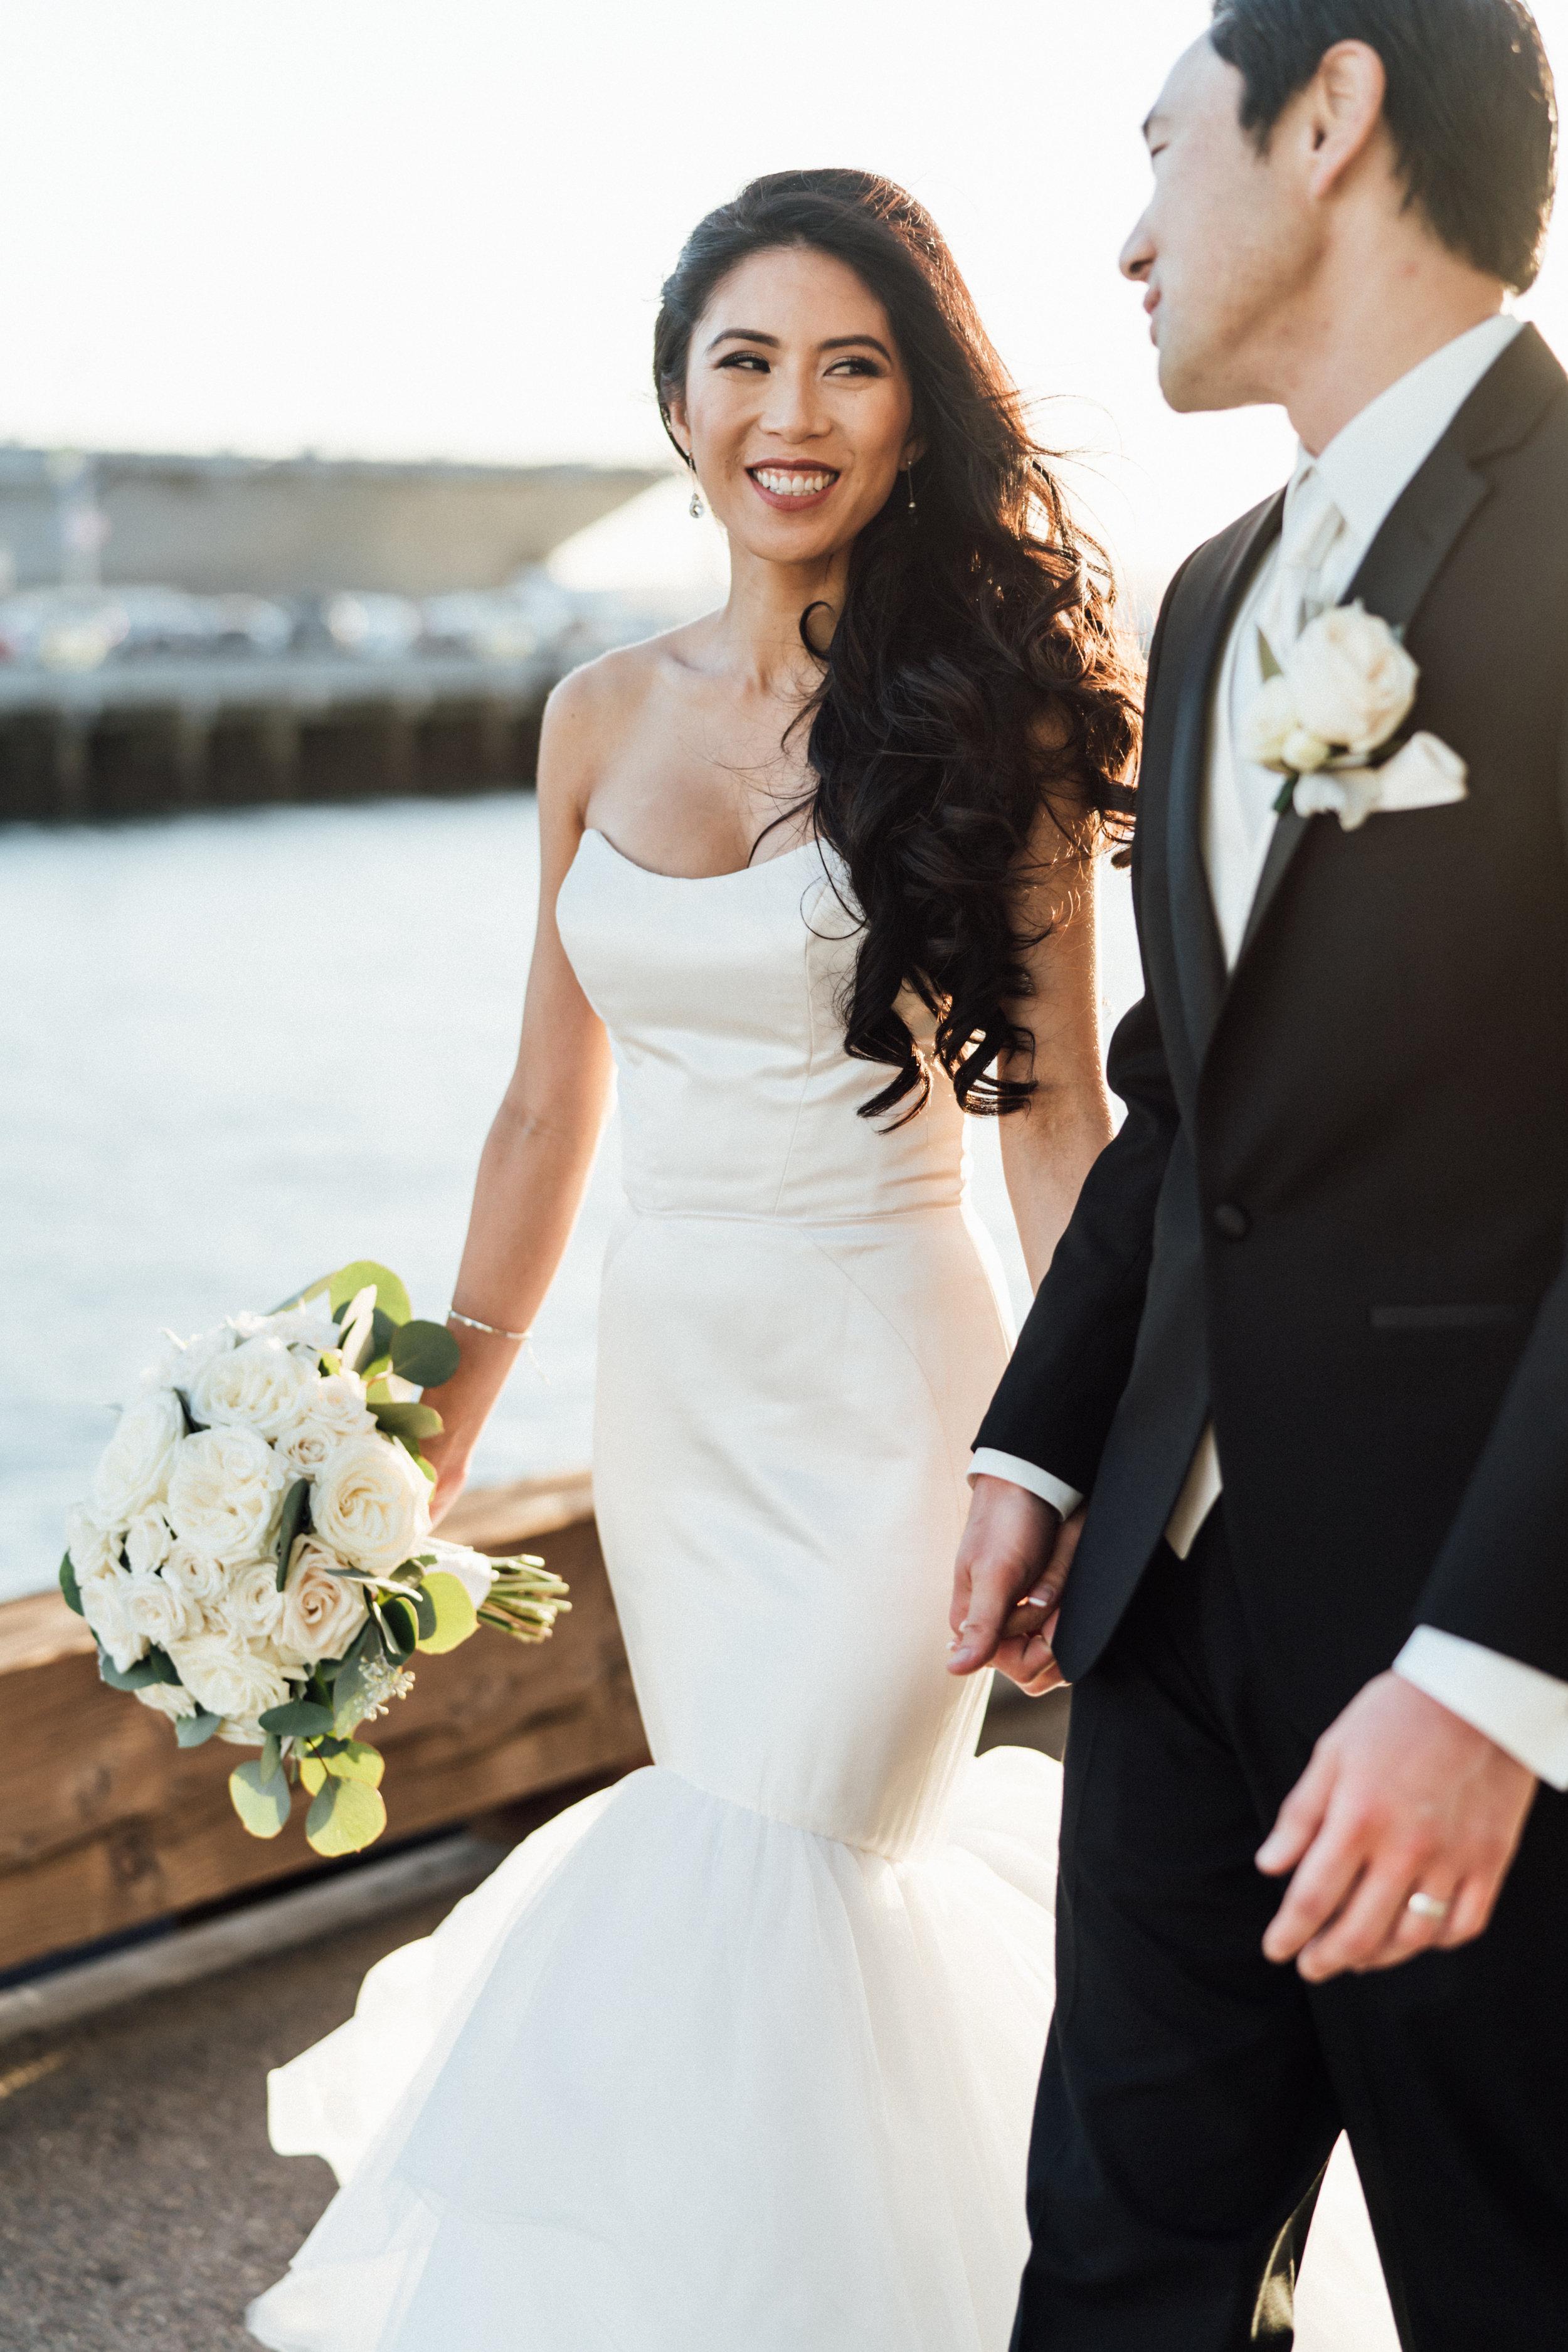 709 Anna _ Danny Wedding SUP08558.jpg